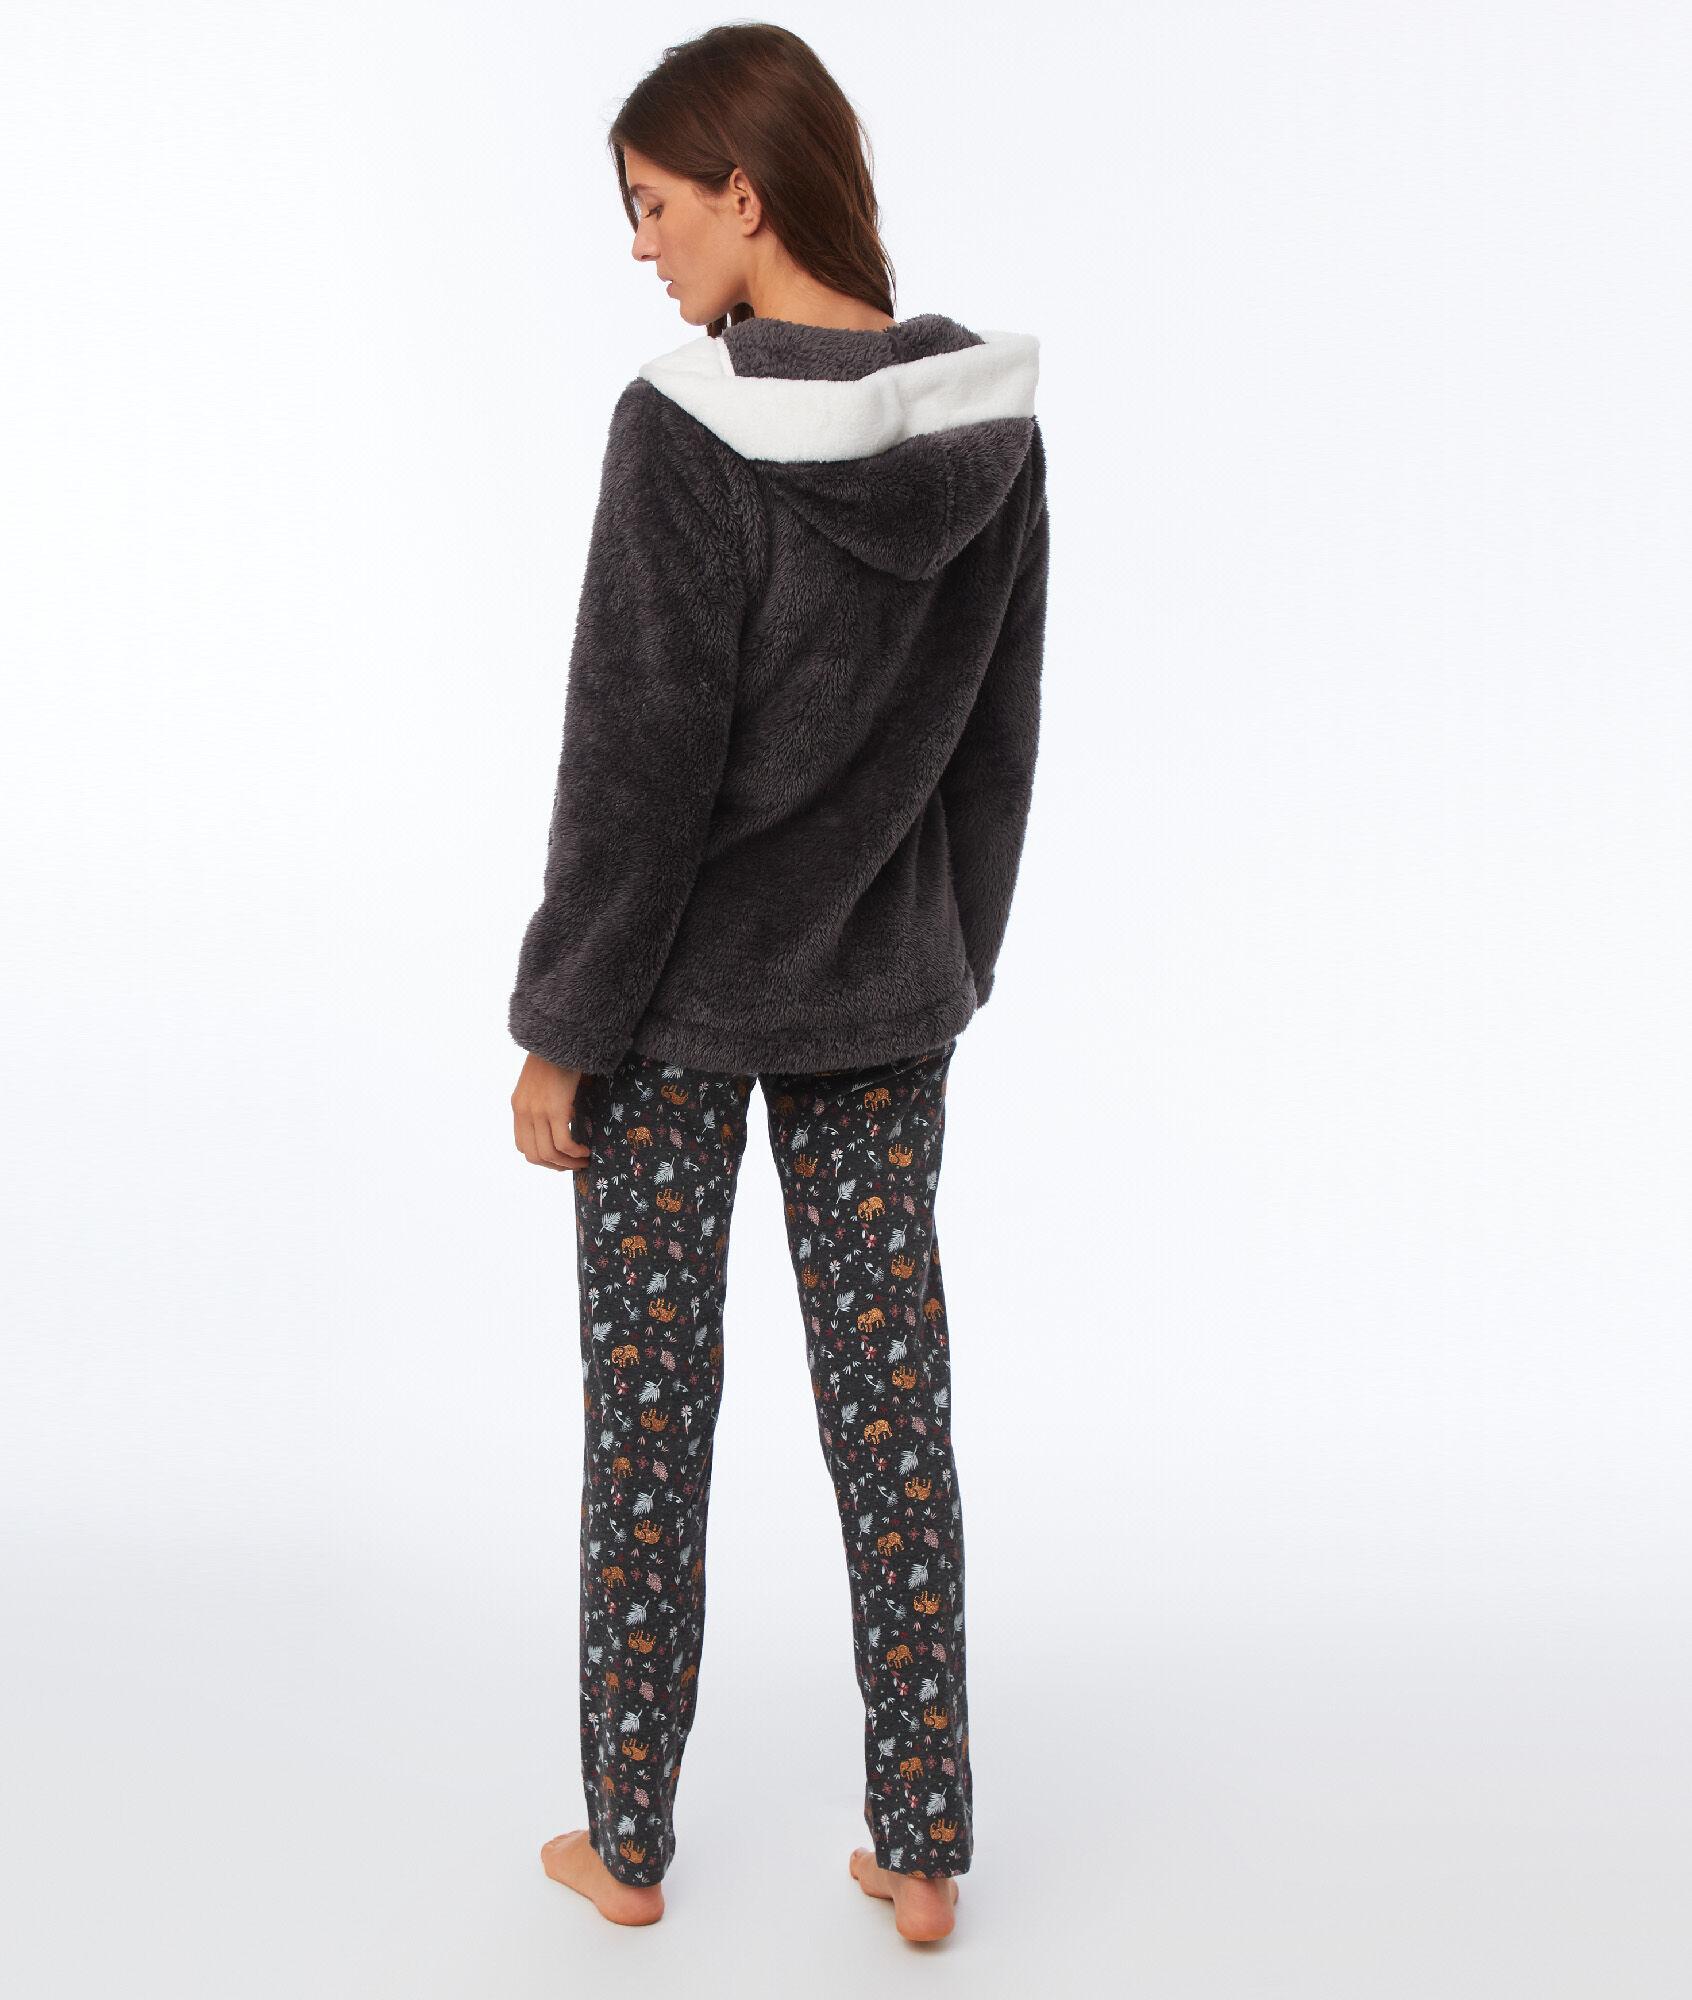 Pyjama trois pi ces l phant matteo anthracite etam - Pyjama elephant ...